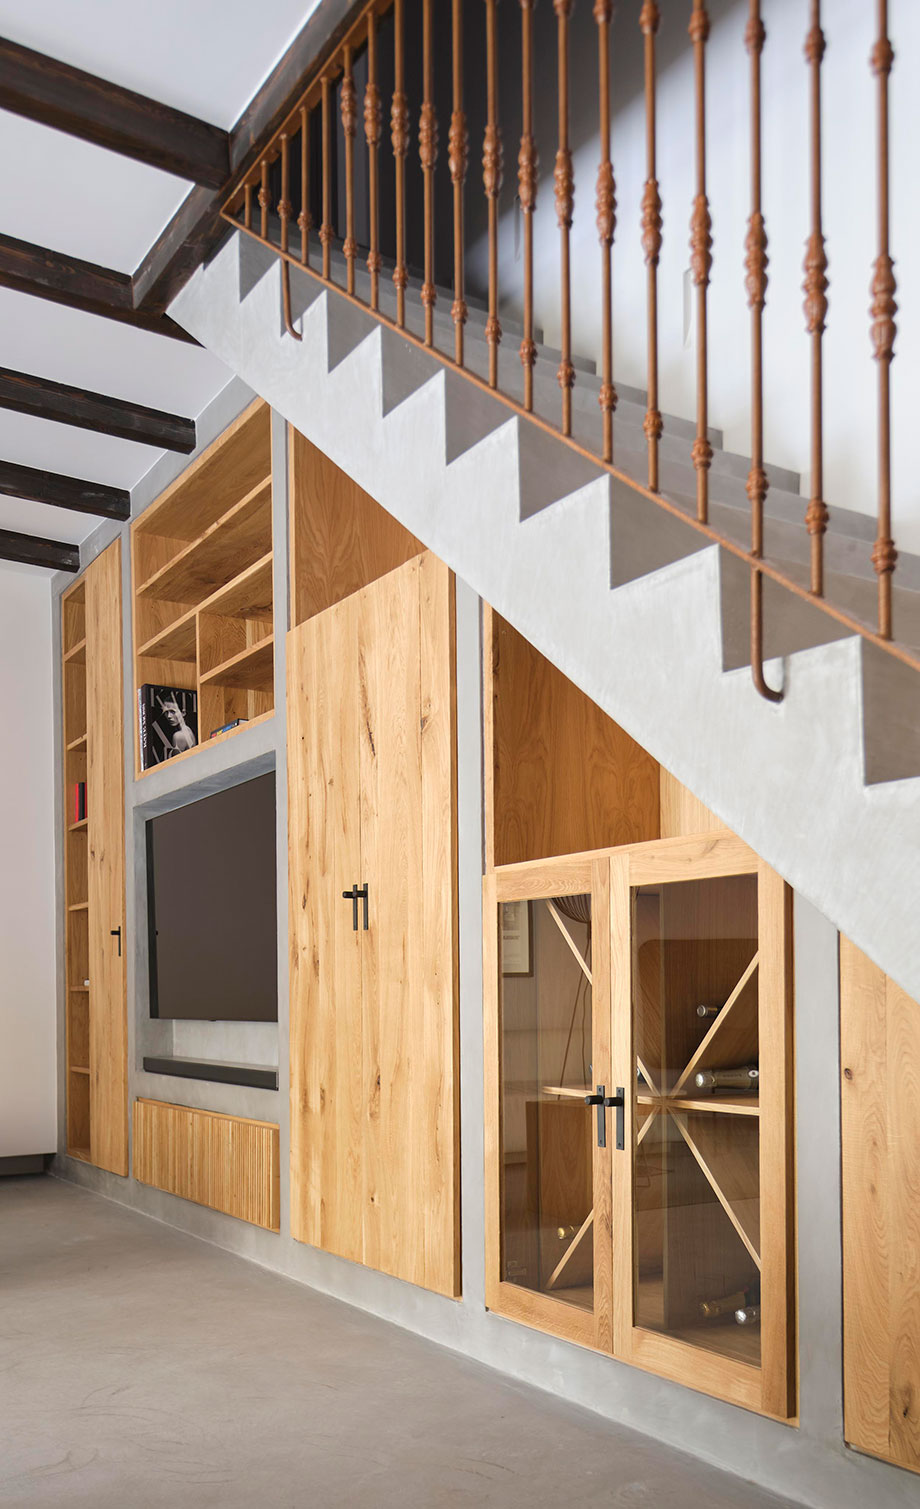 casa lledoner xxxii de minimal studio (10) - foto art sanchez